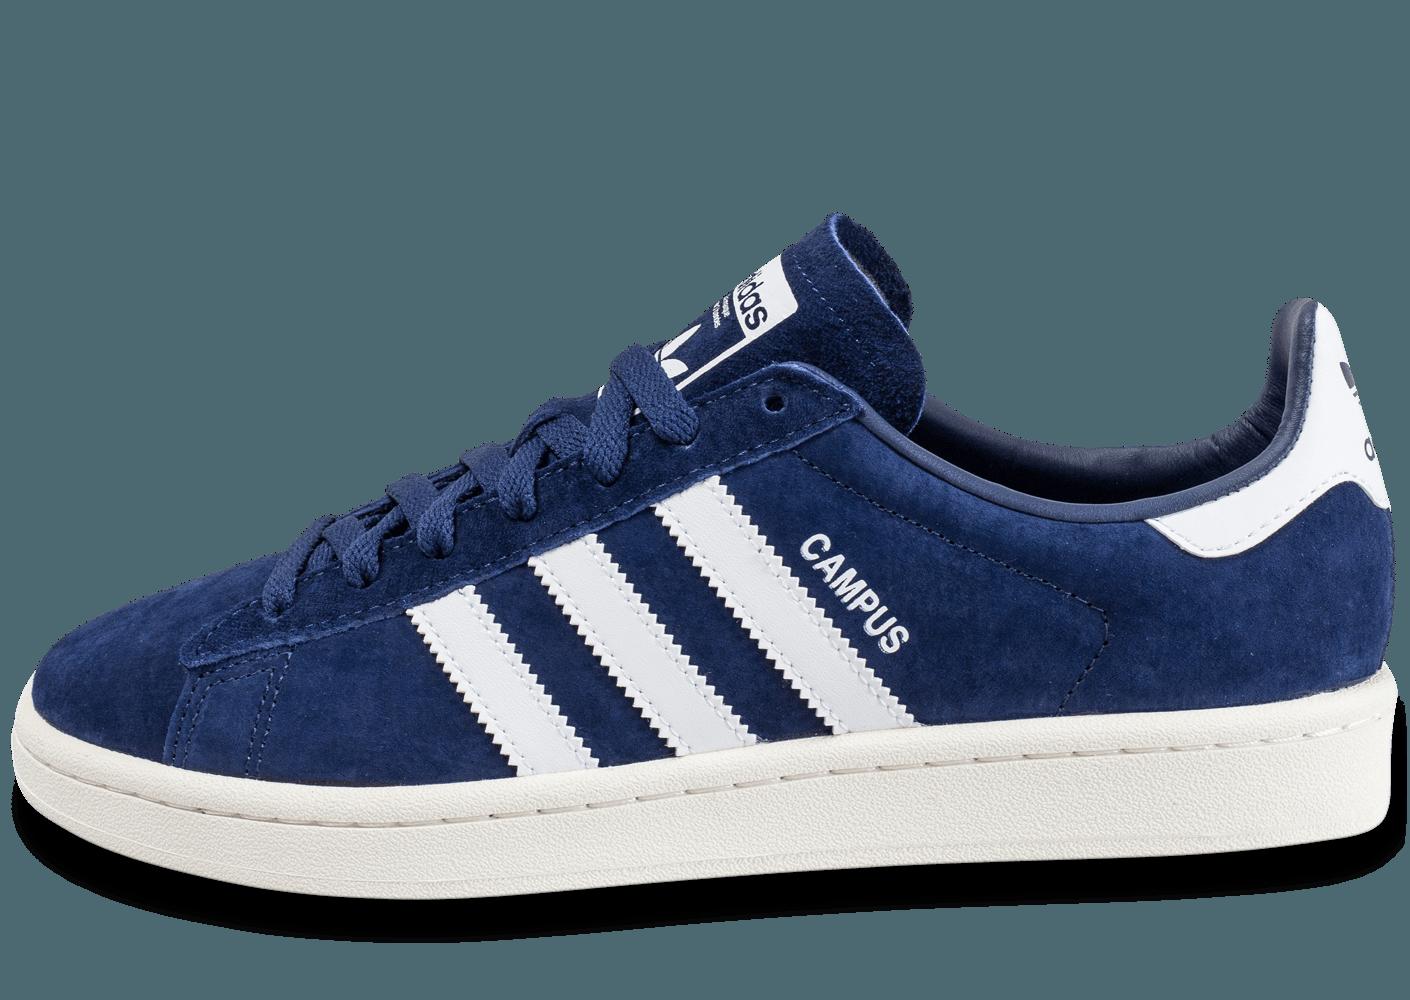 c6cb2e6f967 chaussure adidas bleu homme pas cher